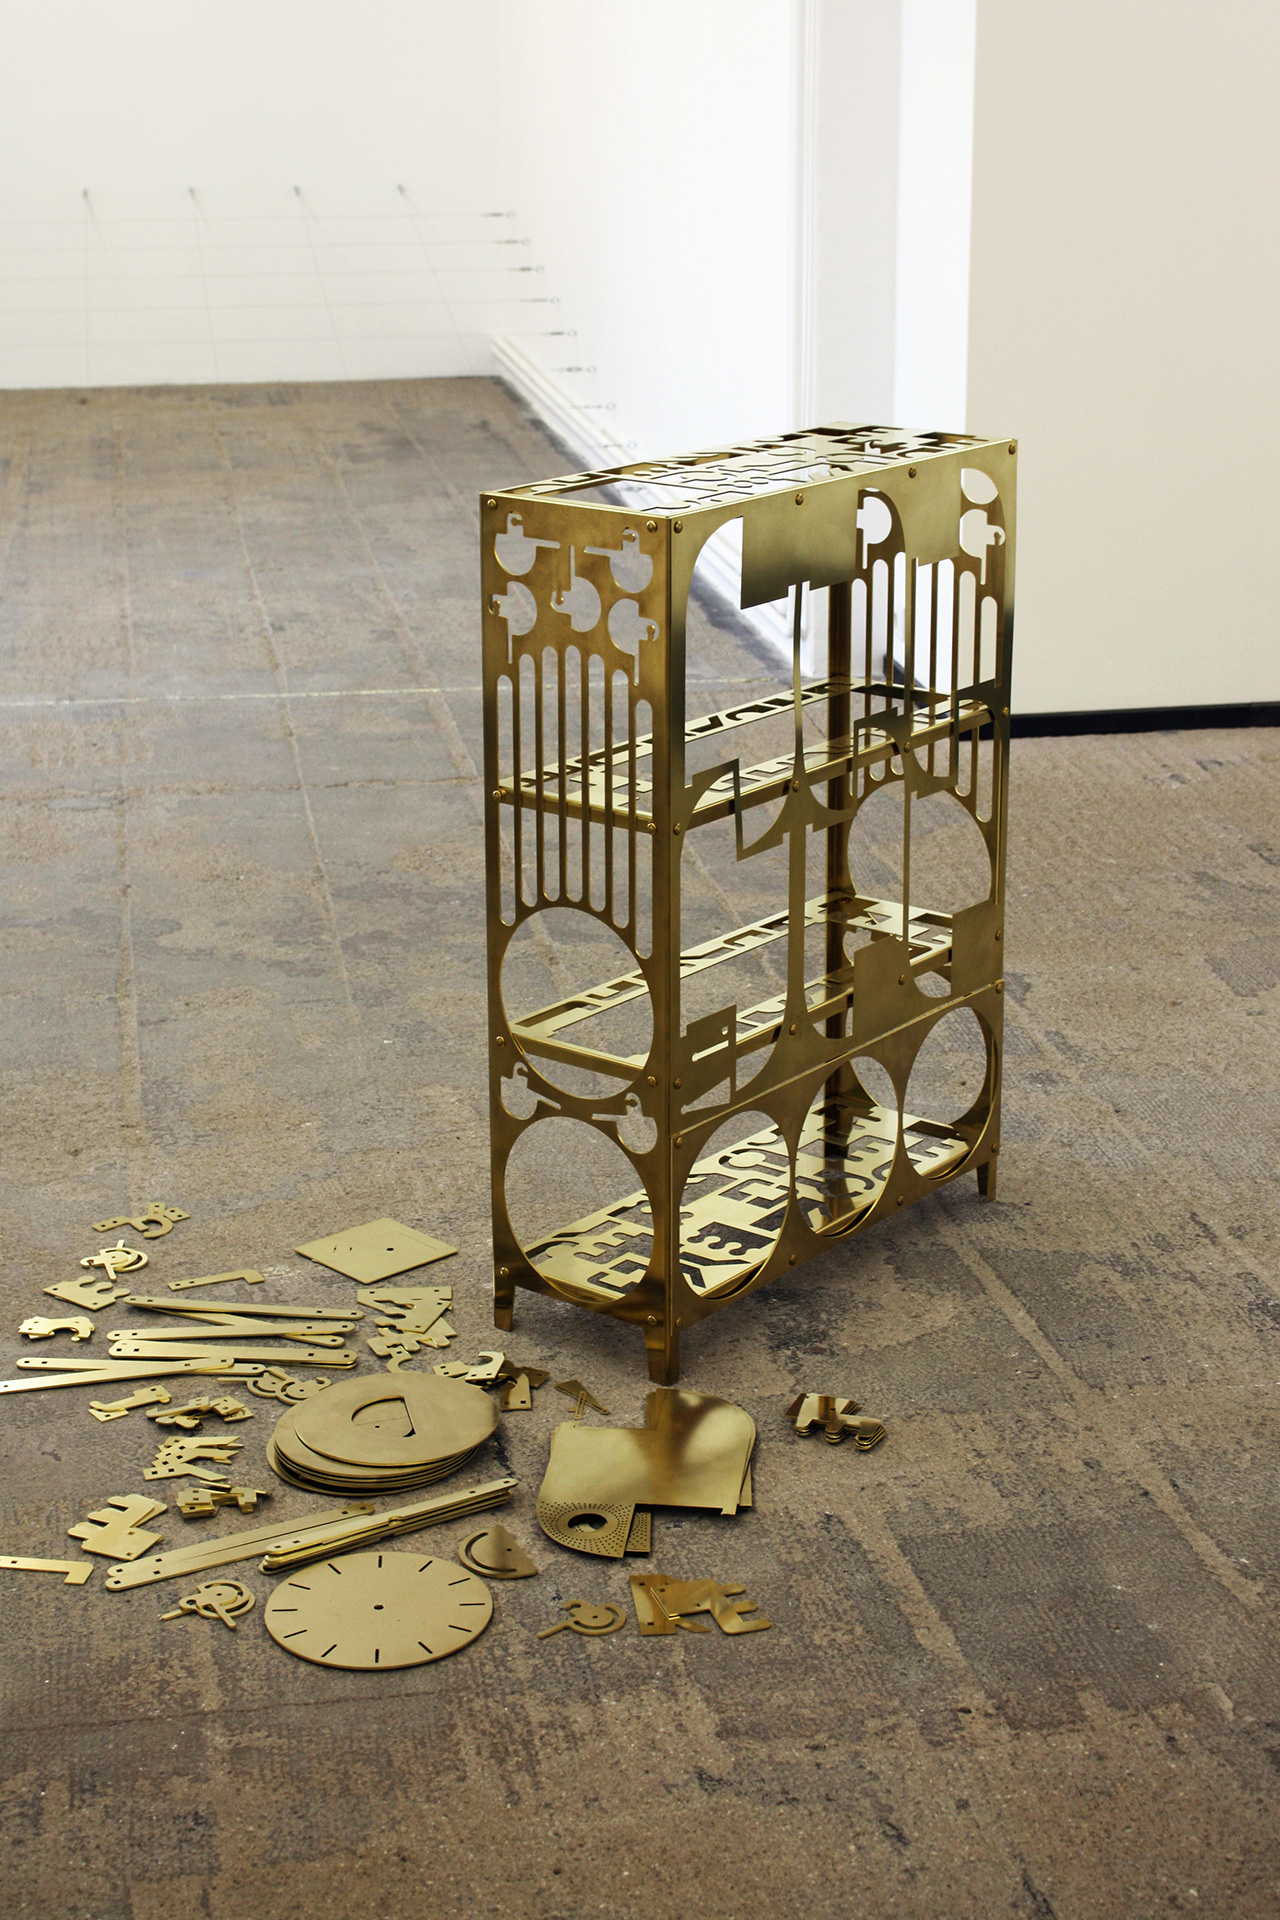 parasite-production-samuel-treindl-brass-shelf-04